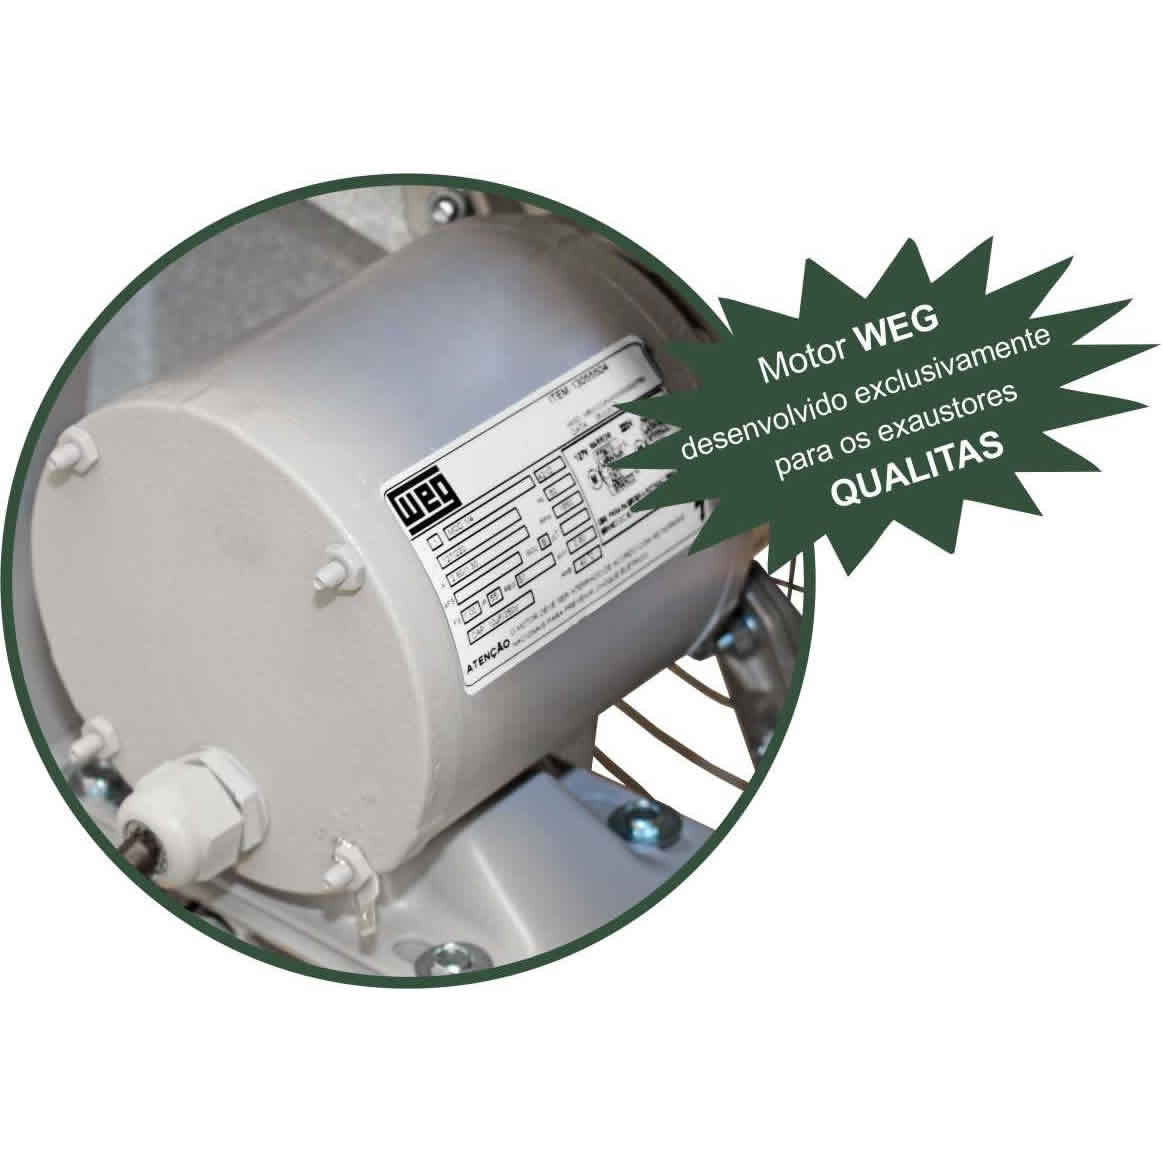 Exaustor Axial Ø100cm | EQ1000 Motor WEG - Qualitas